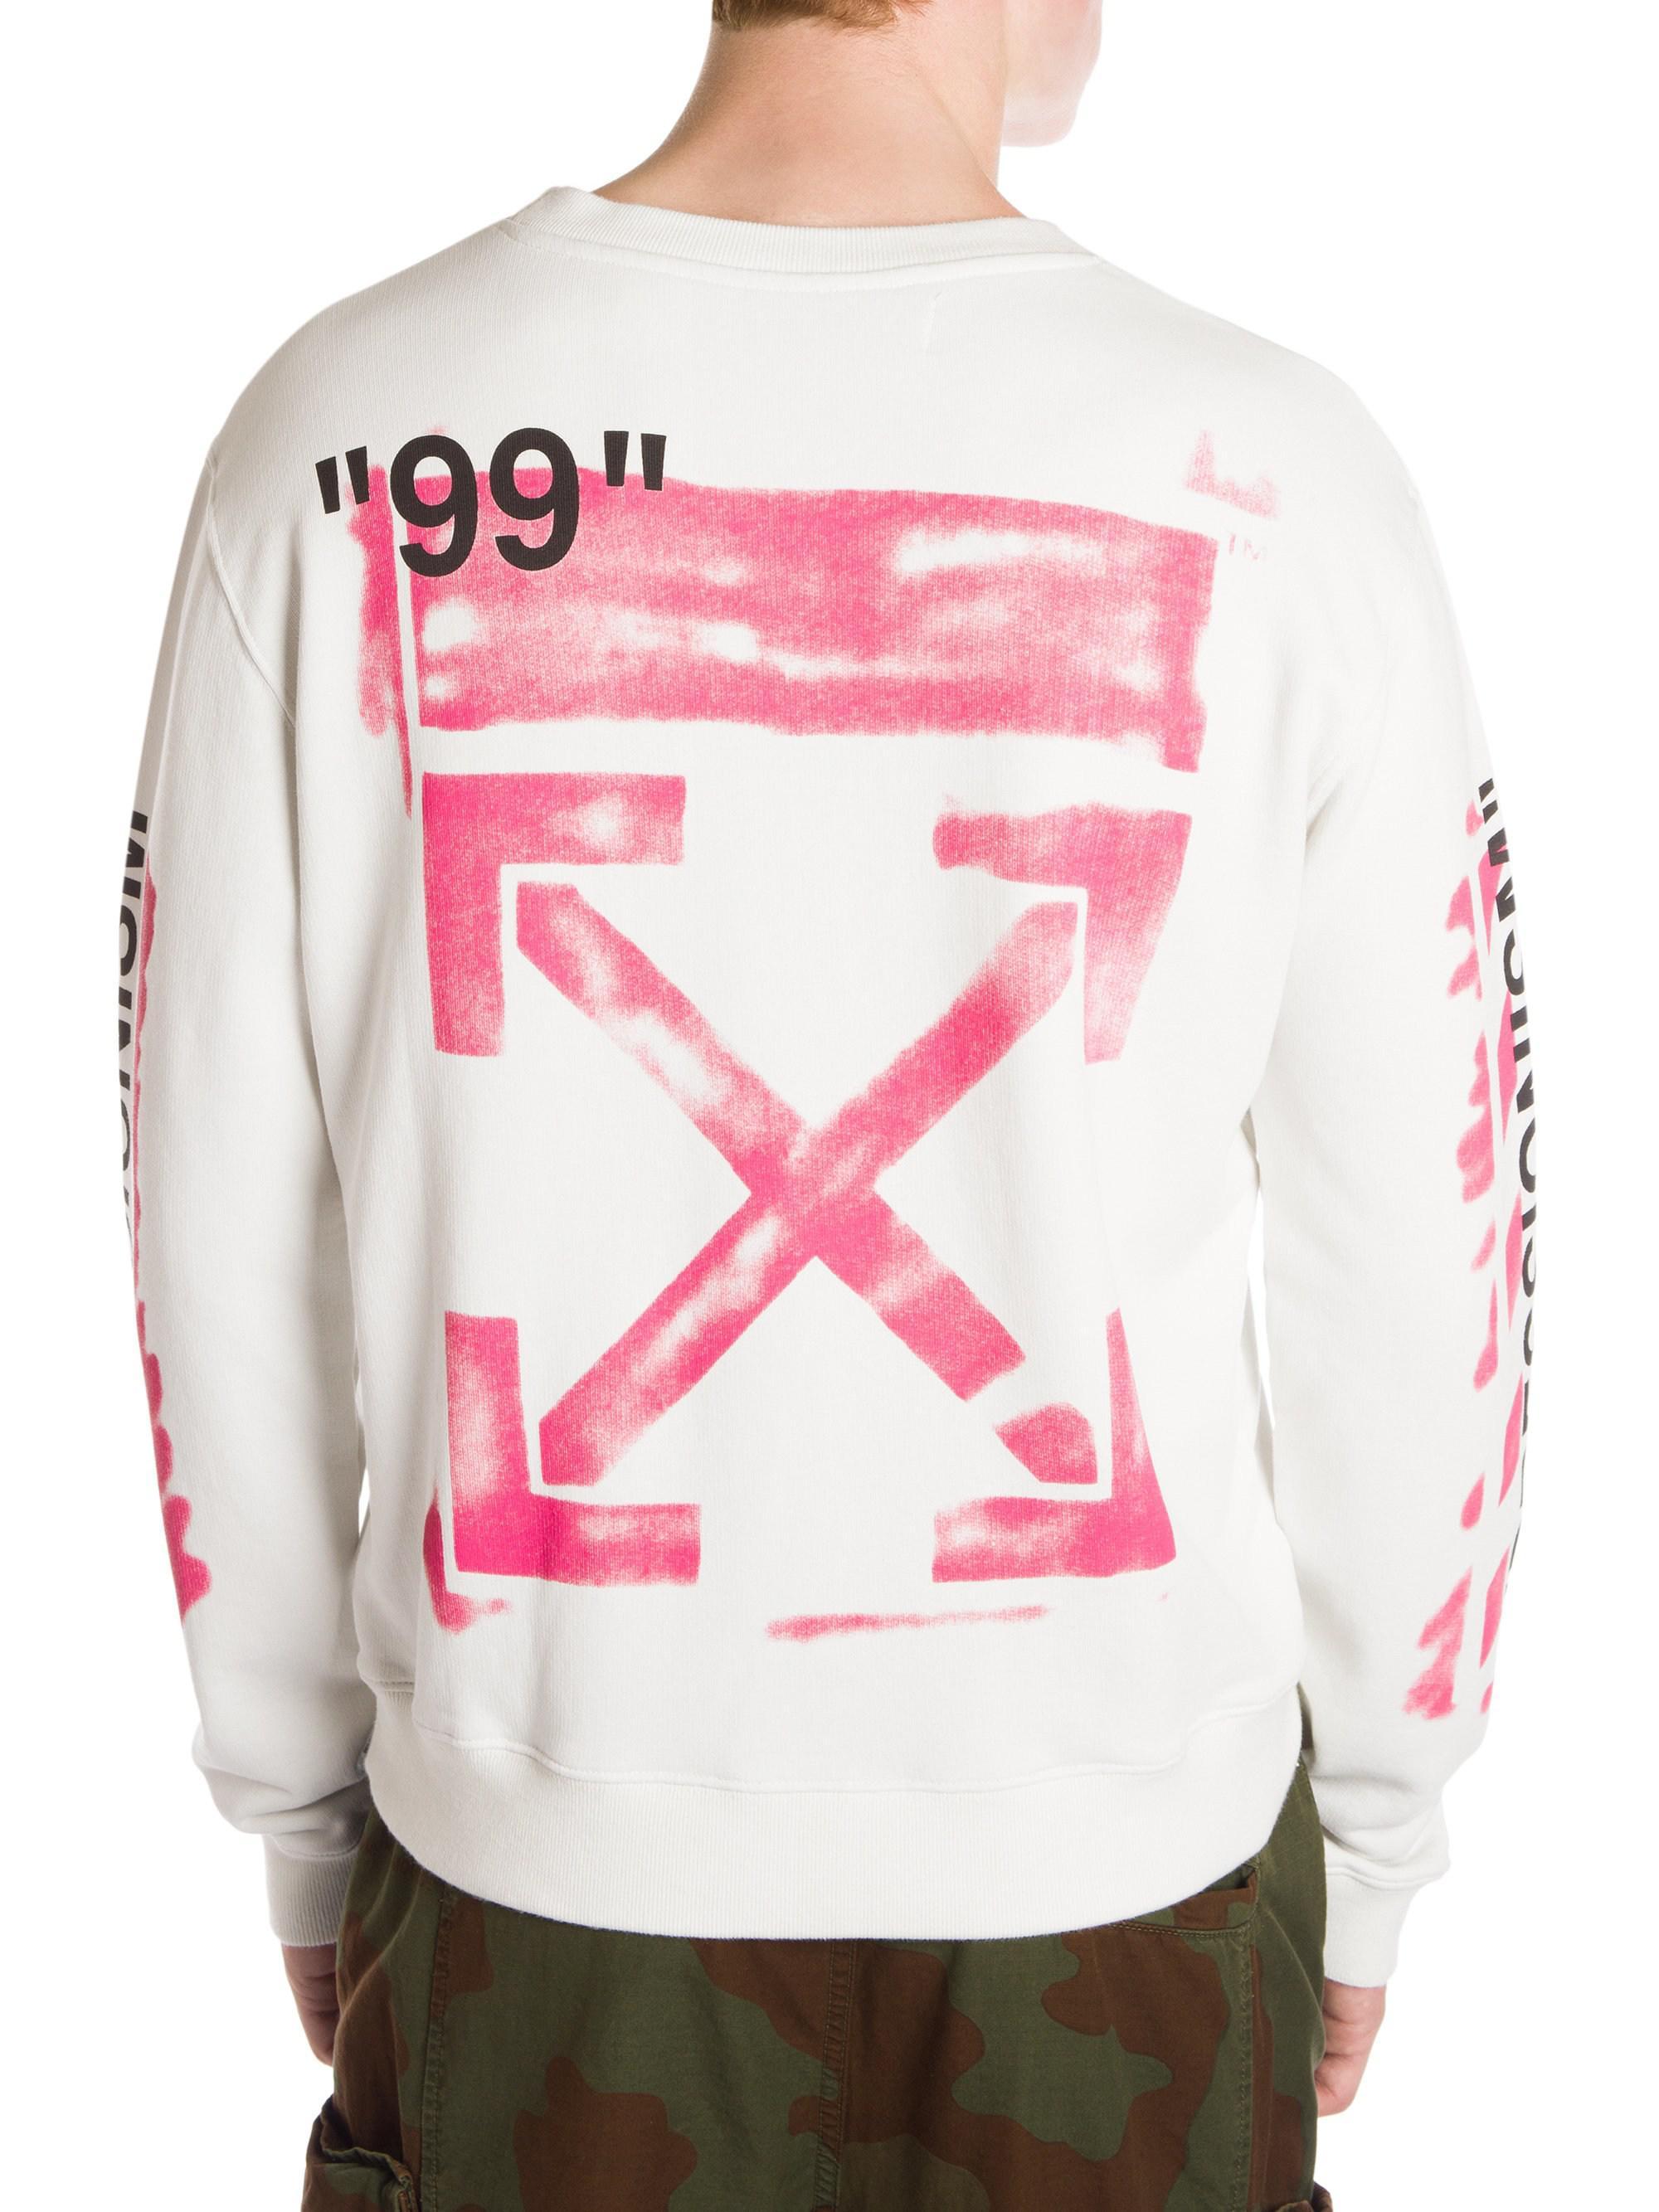 6dded3407fb Off-White c o Virgil Abloh Men s Diagonal Stencil Sweatshirt - White ...